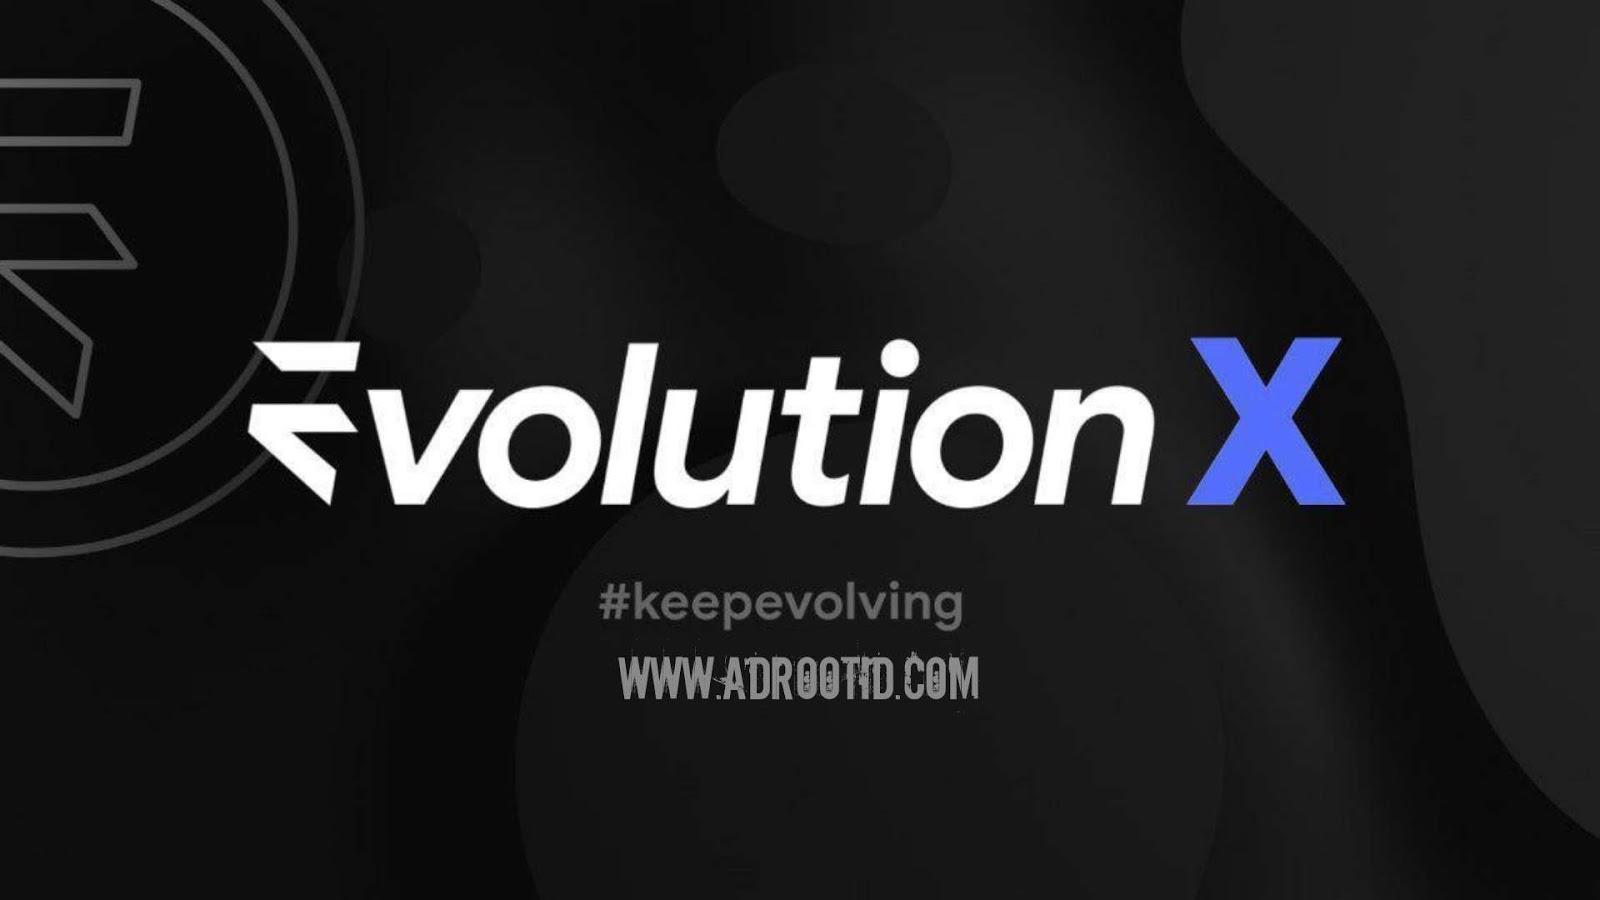 Rom evolution x redmi 5 plus